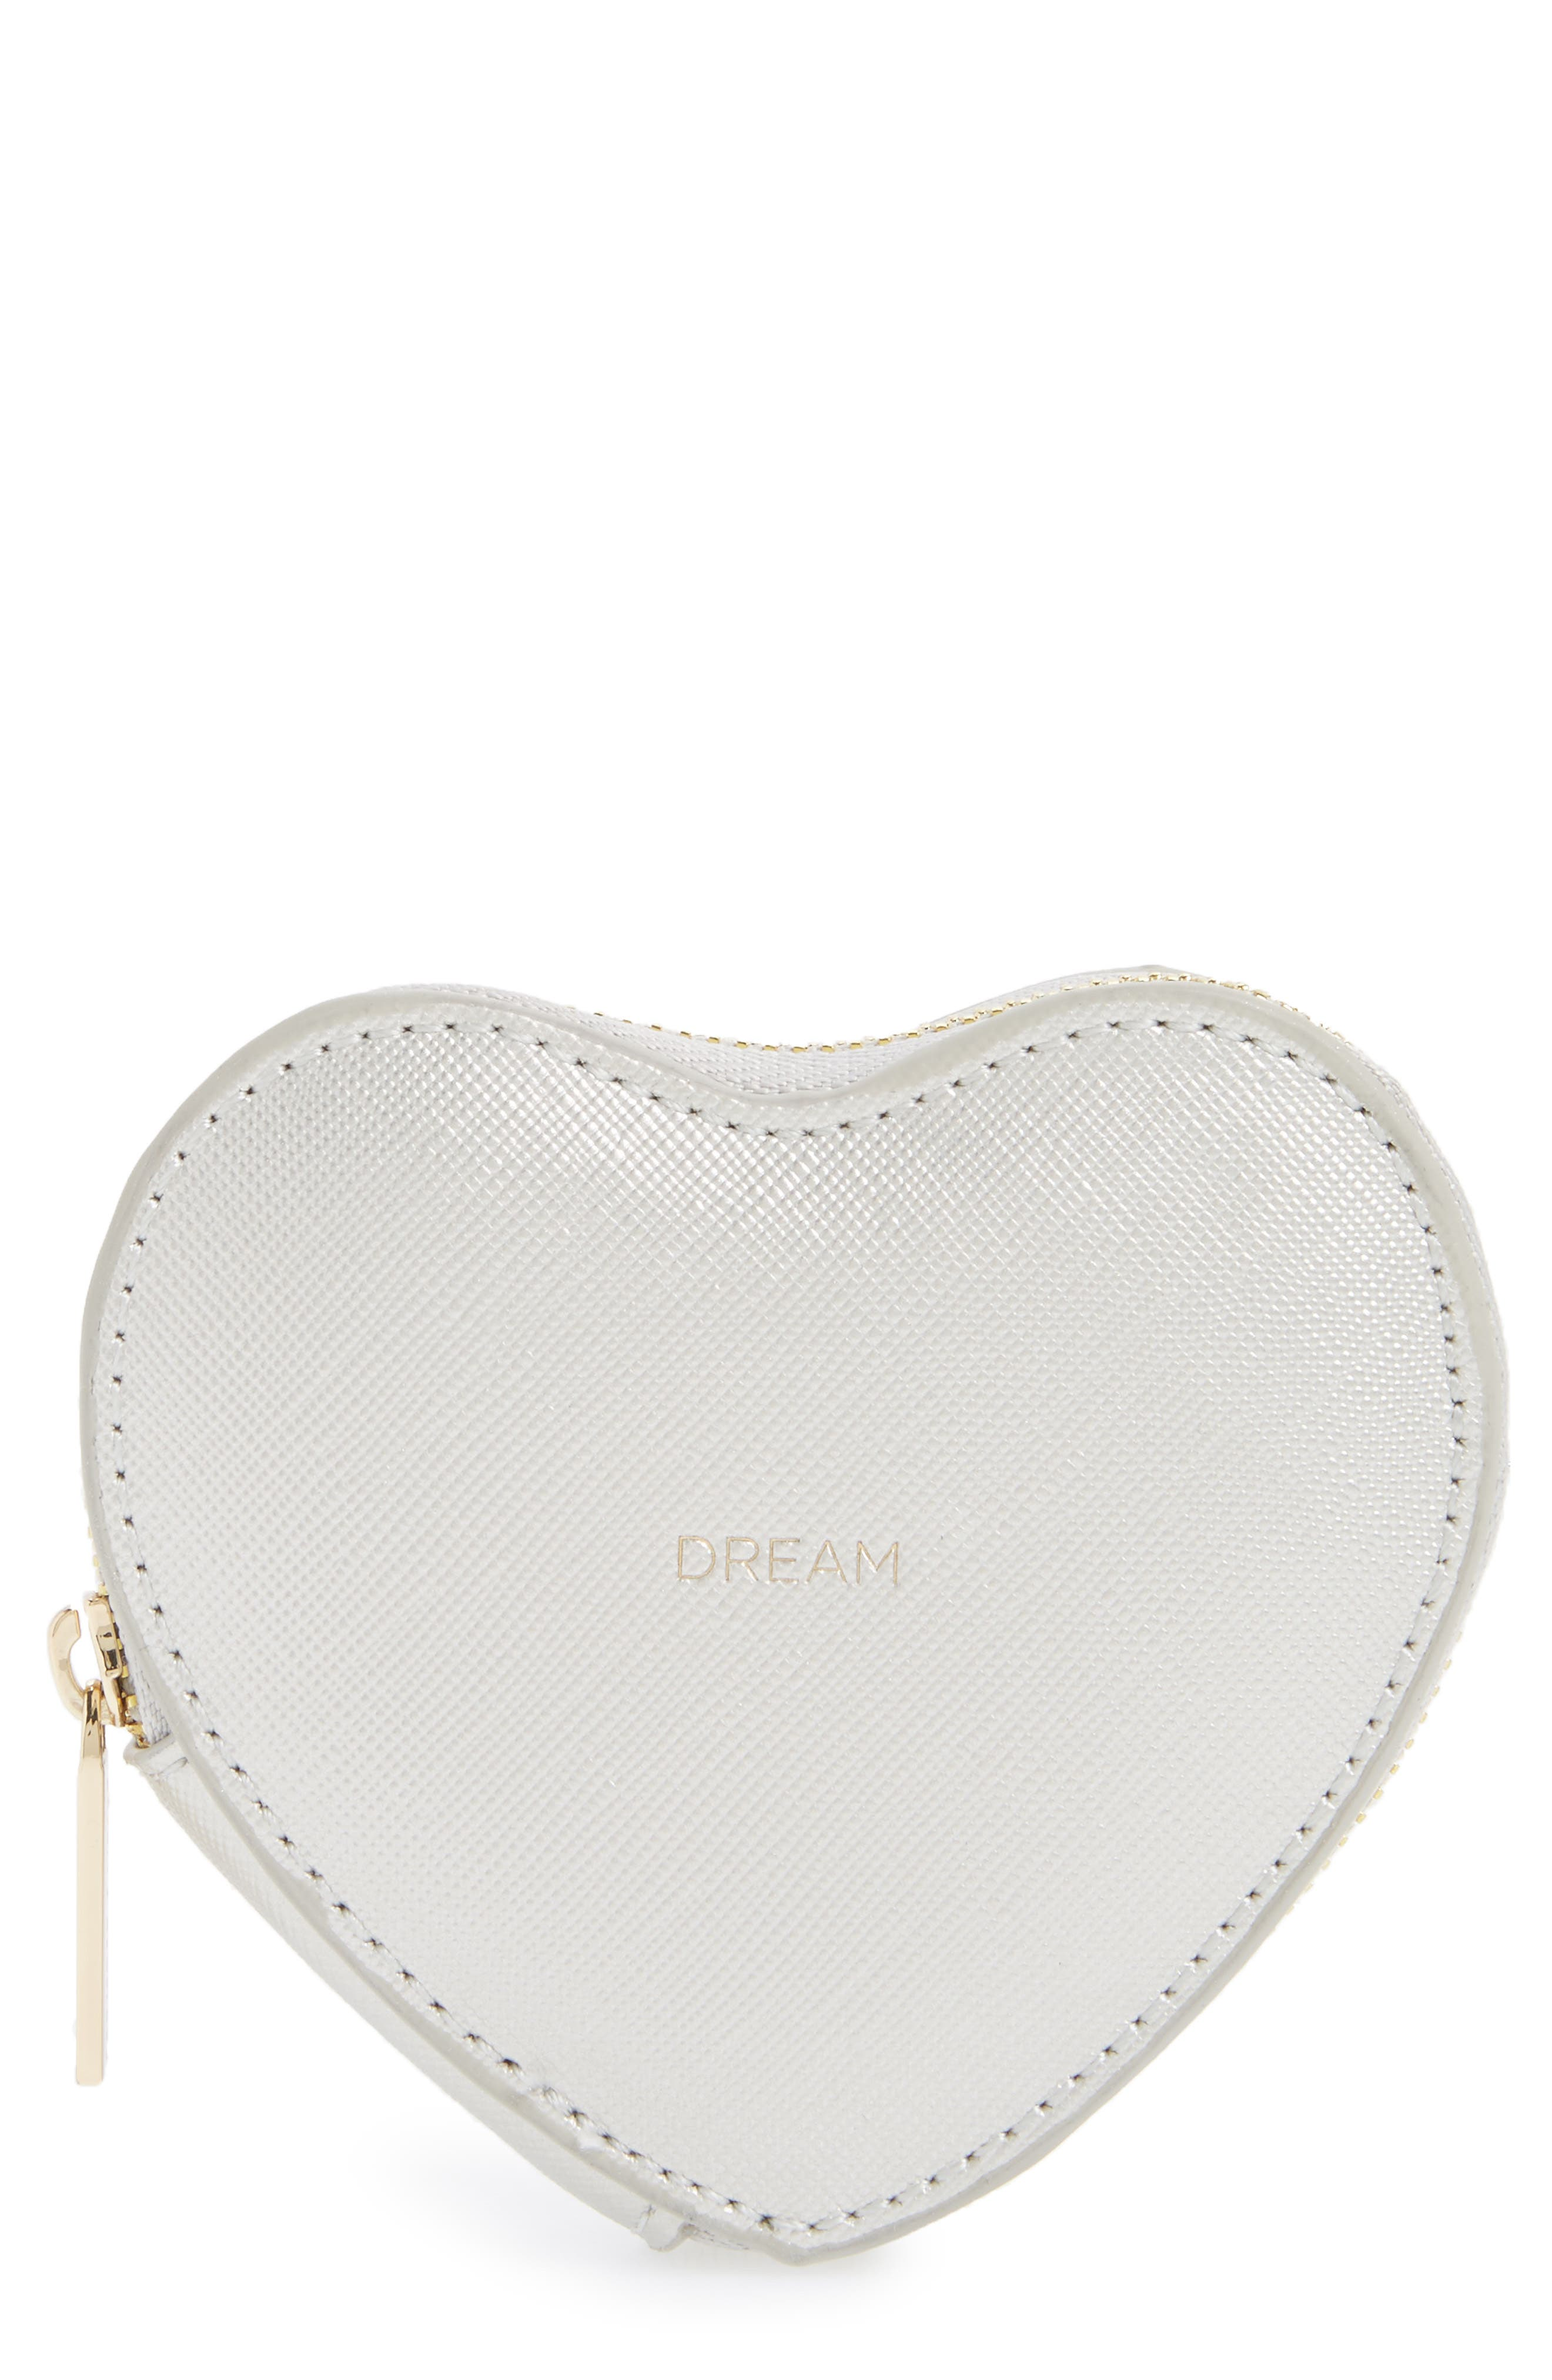 Estella Bartlett Heart Dream Faux Leather Coin Purse